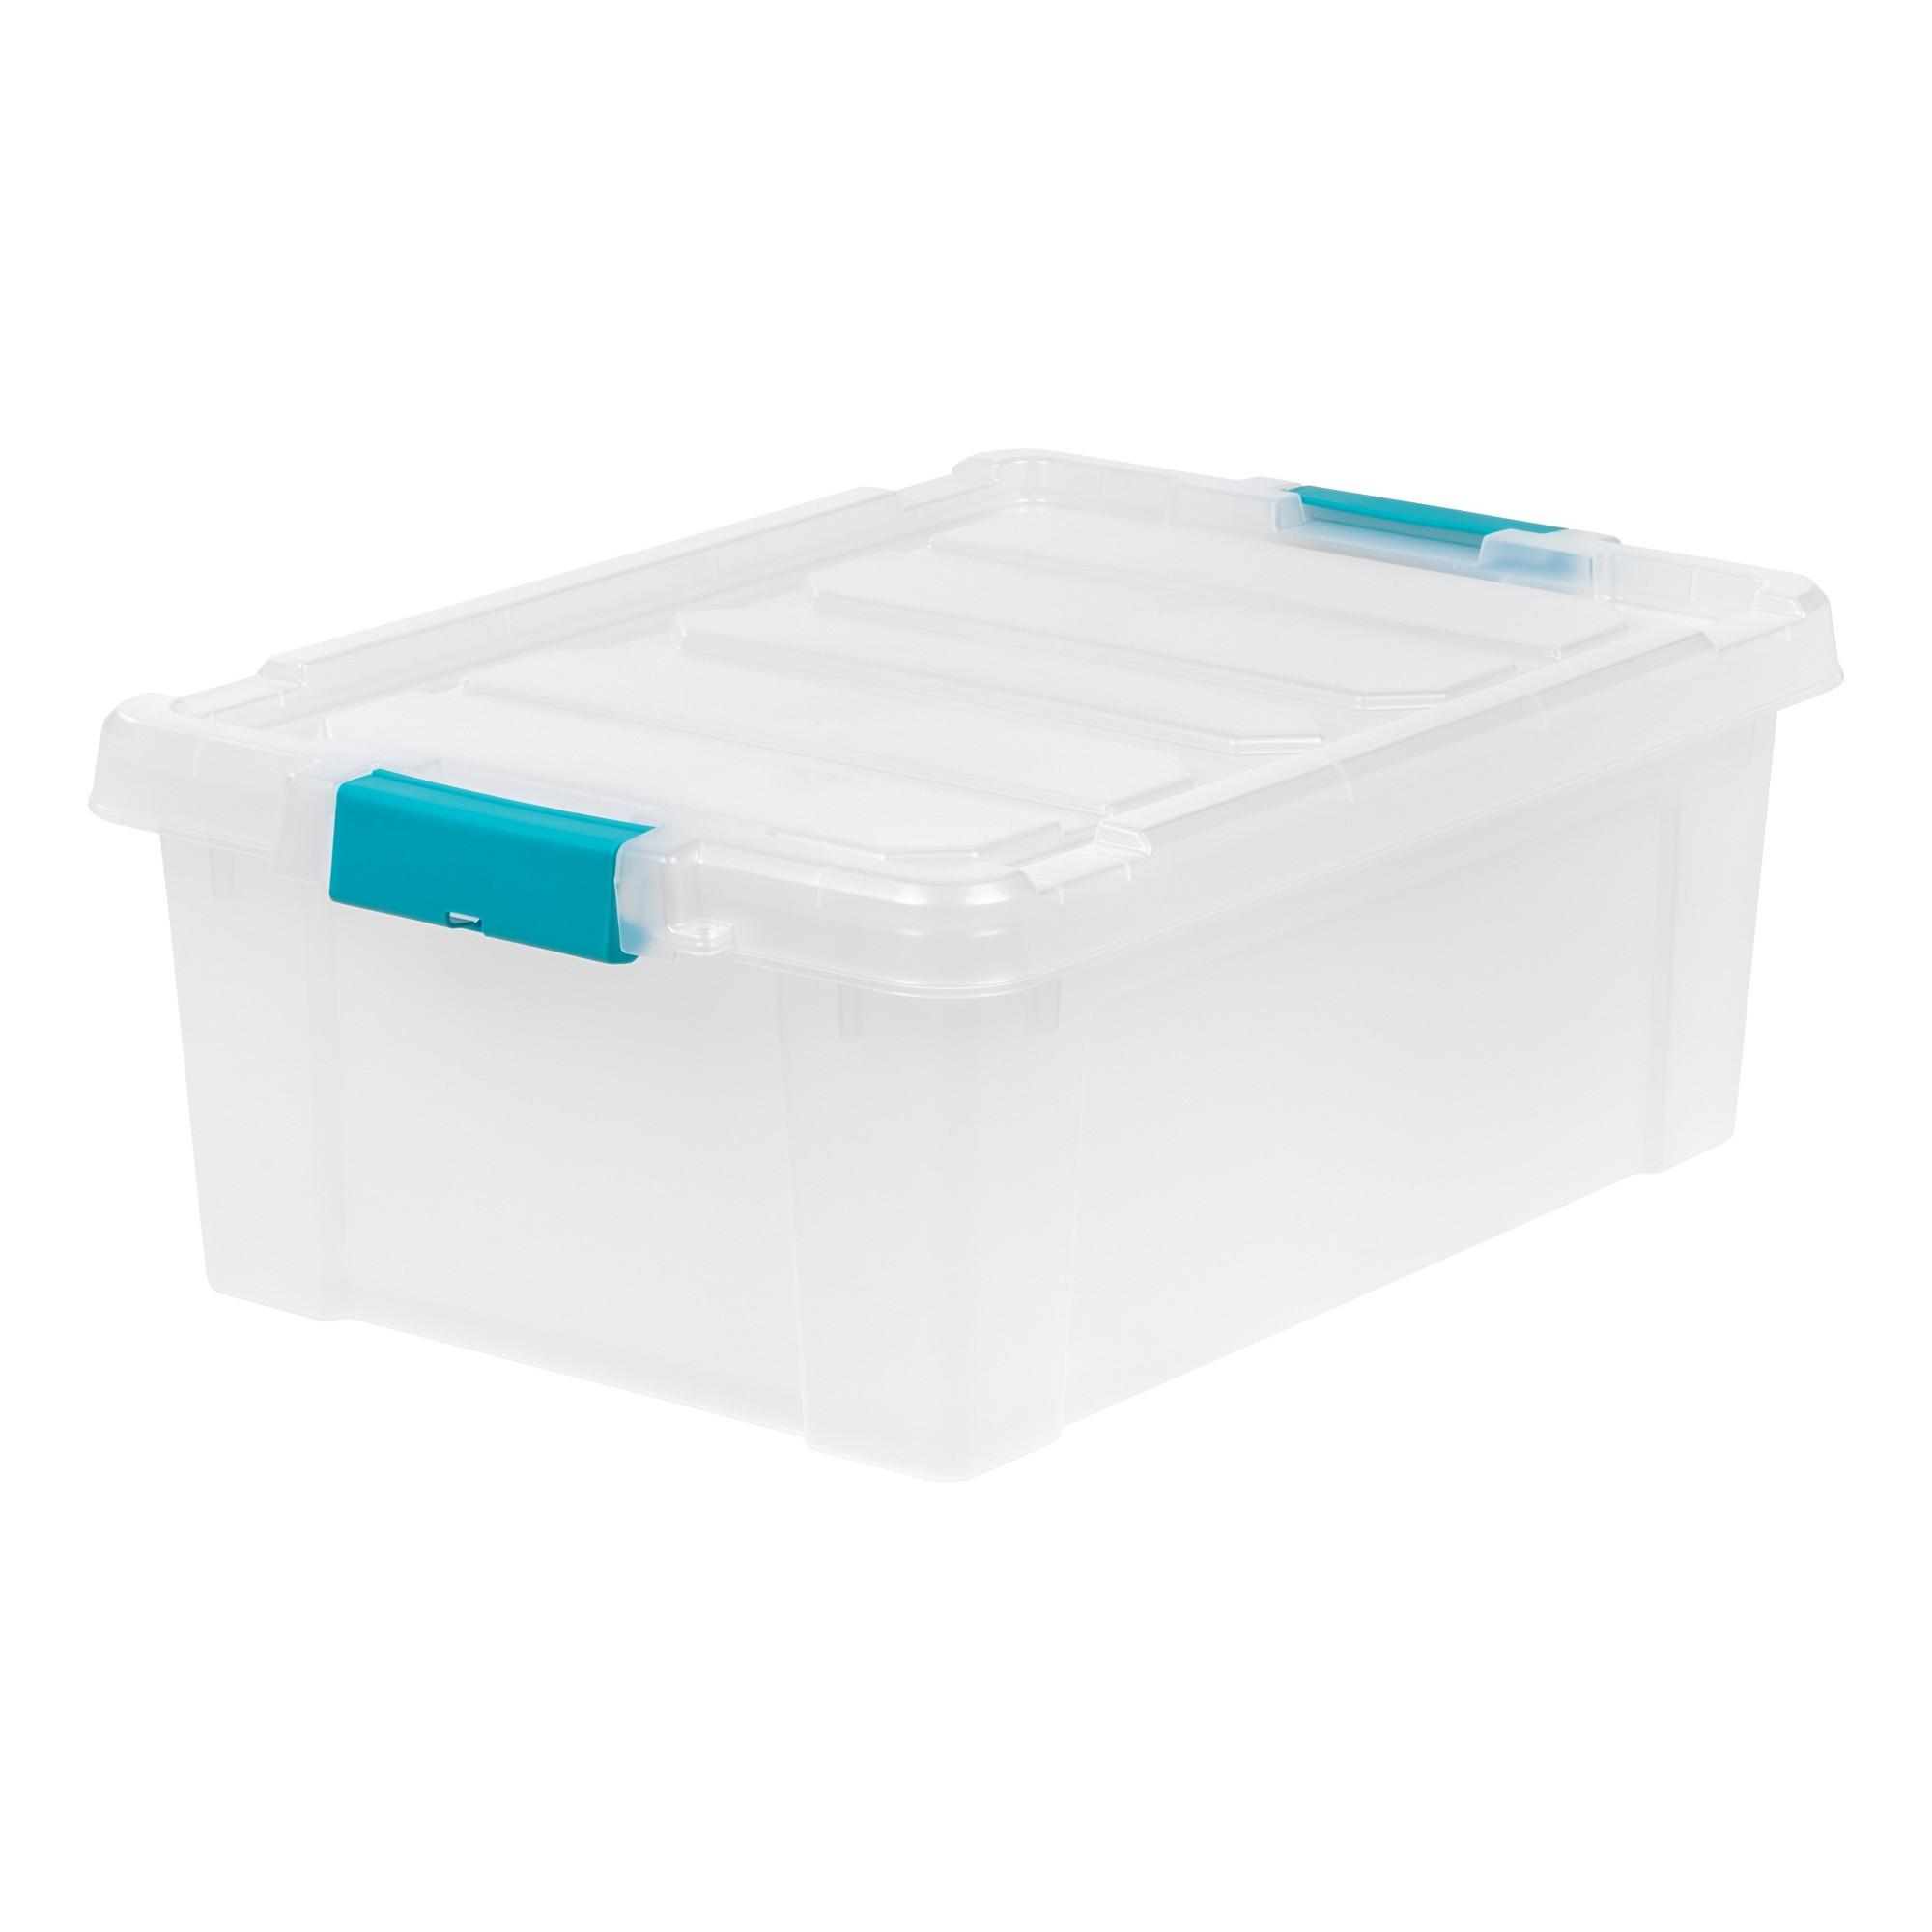 Utility Storage Bins Plastic 4pc Blue Iris Plastic Storage Bins Plastic Storage Storage Bin